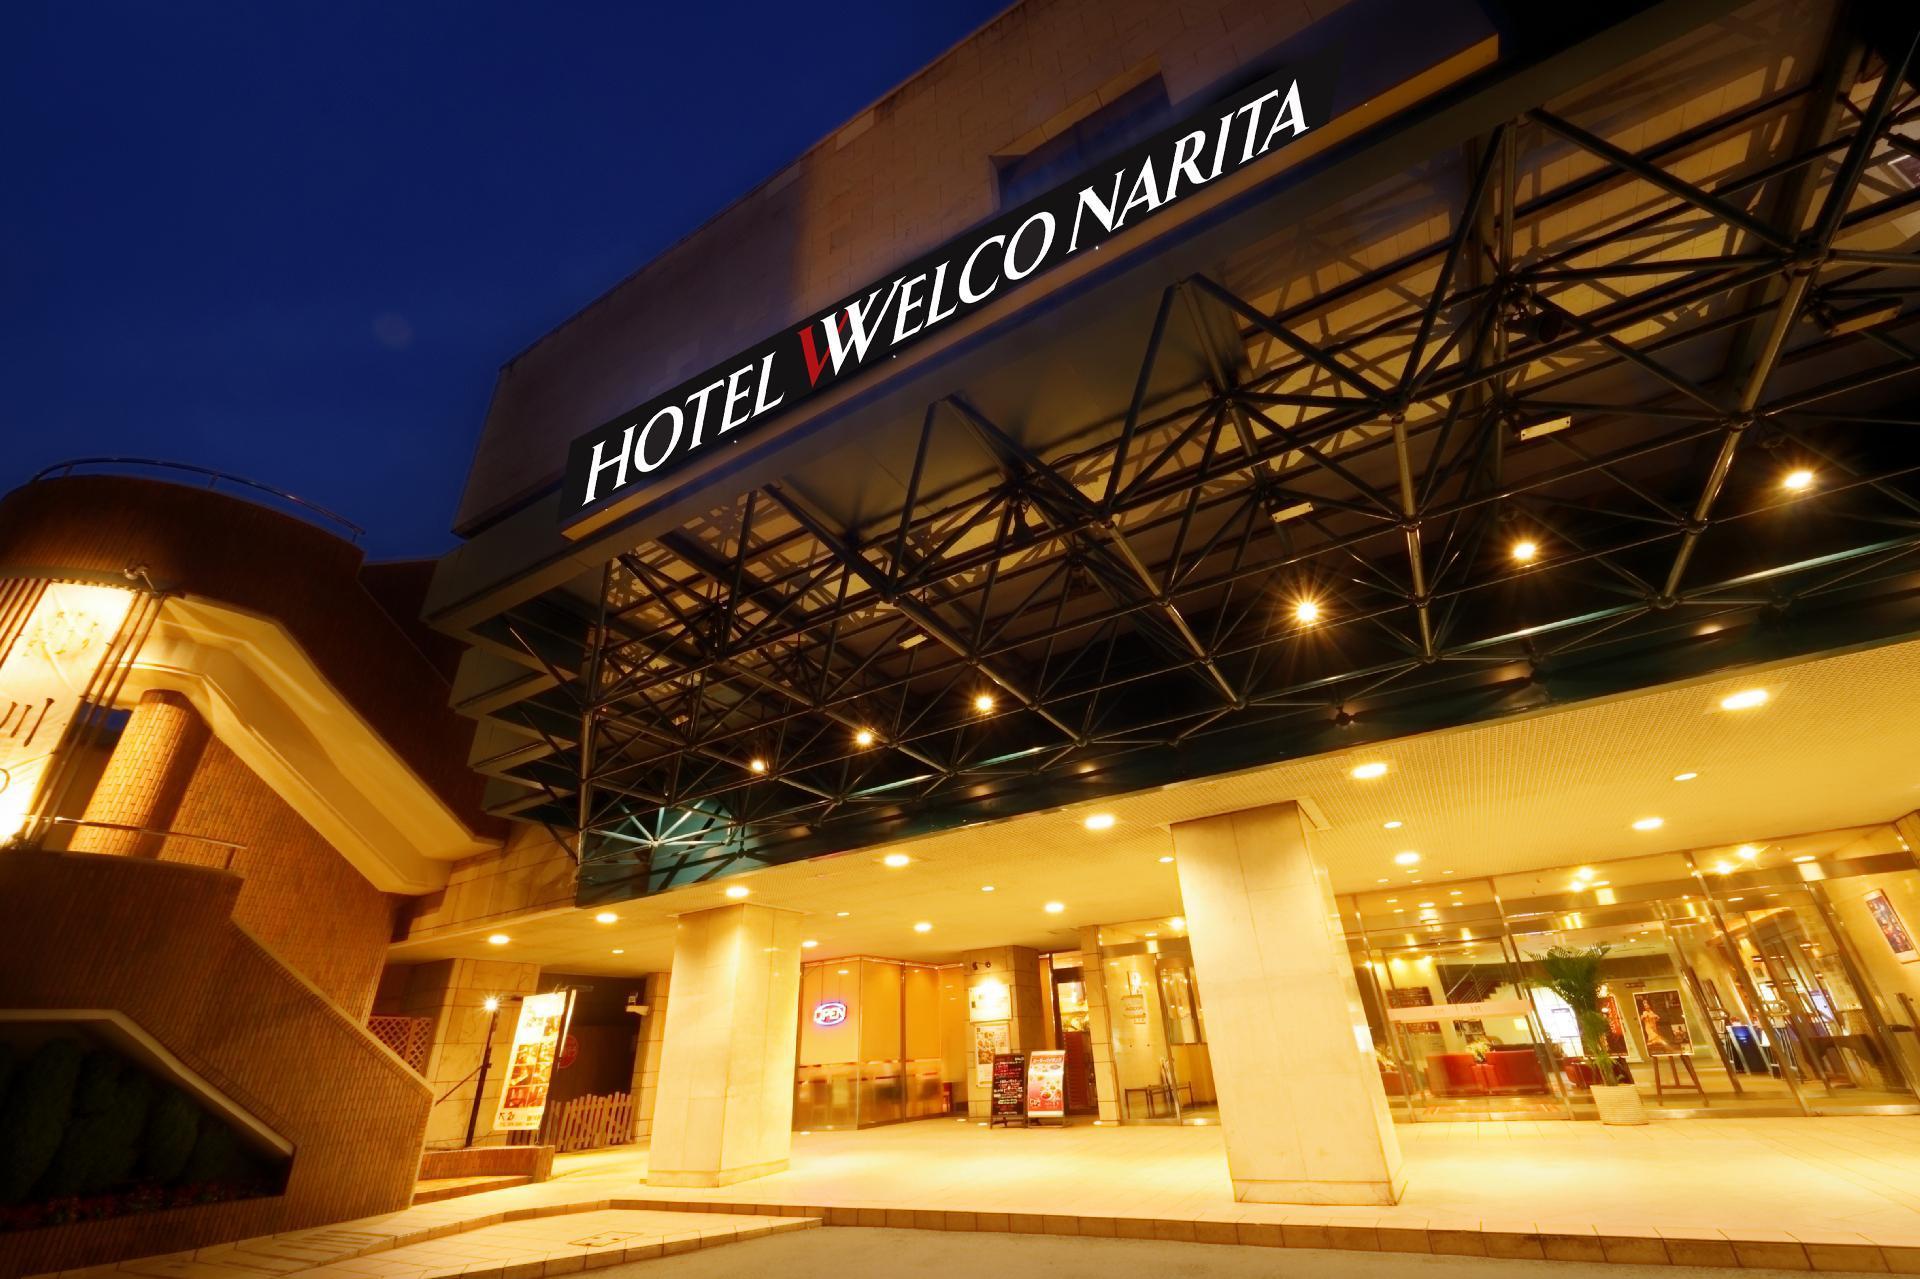 Hotel Welco Narita   Formerly Mercure Hotel Narita